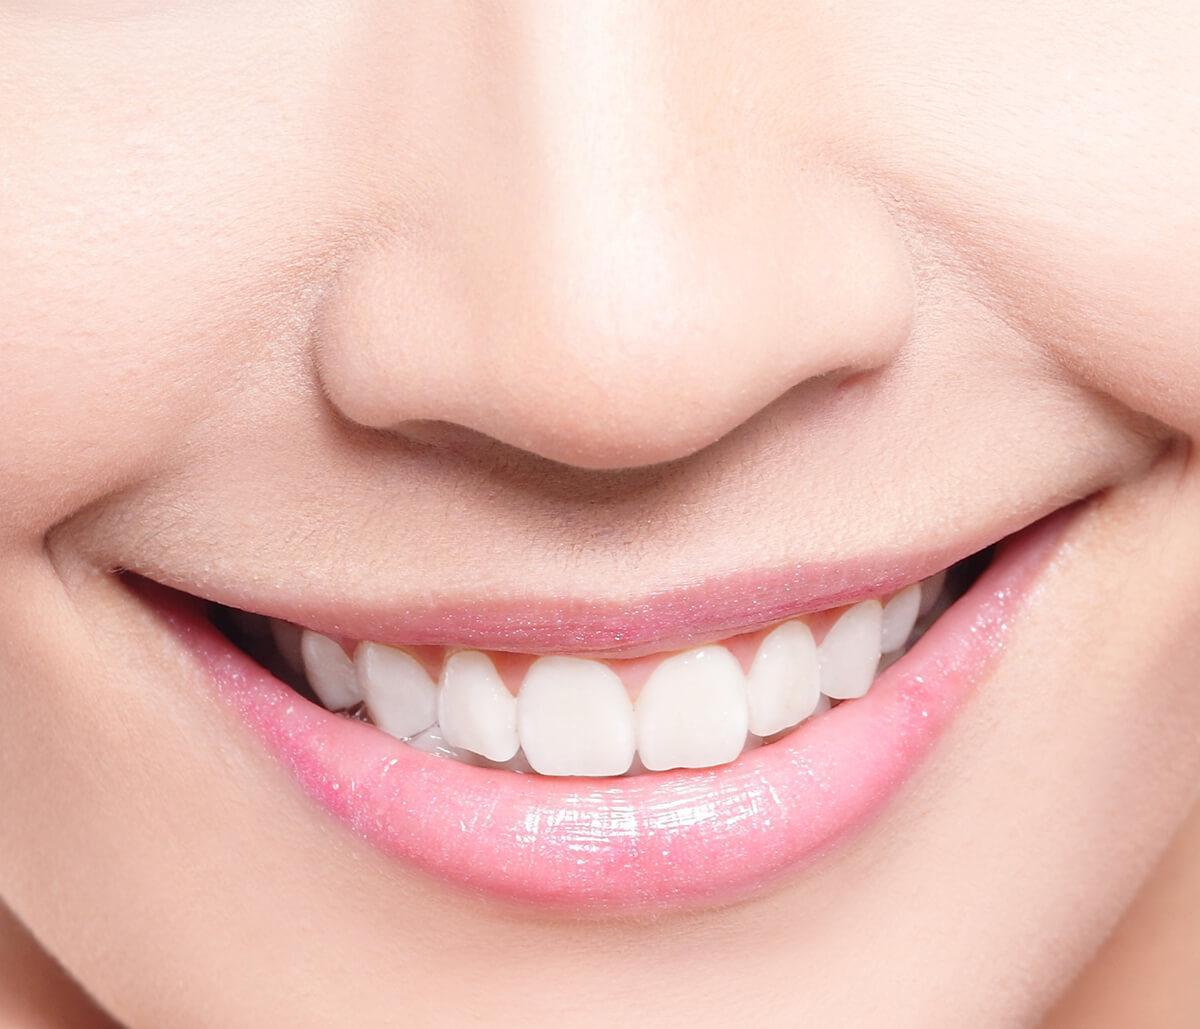 Benefits of Smile Makeover in Aliso Viejo CA Area